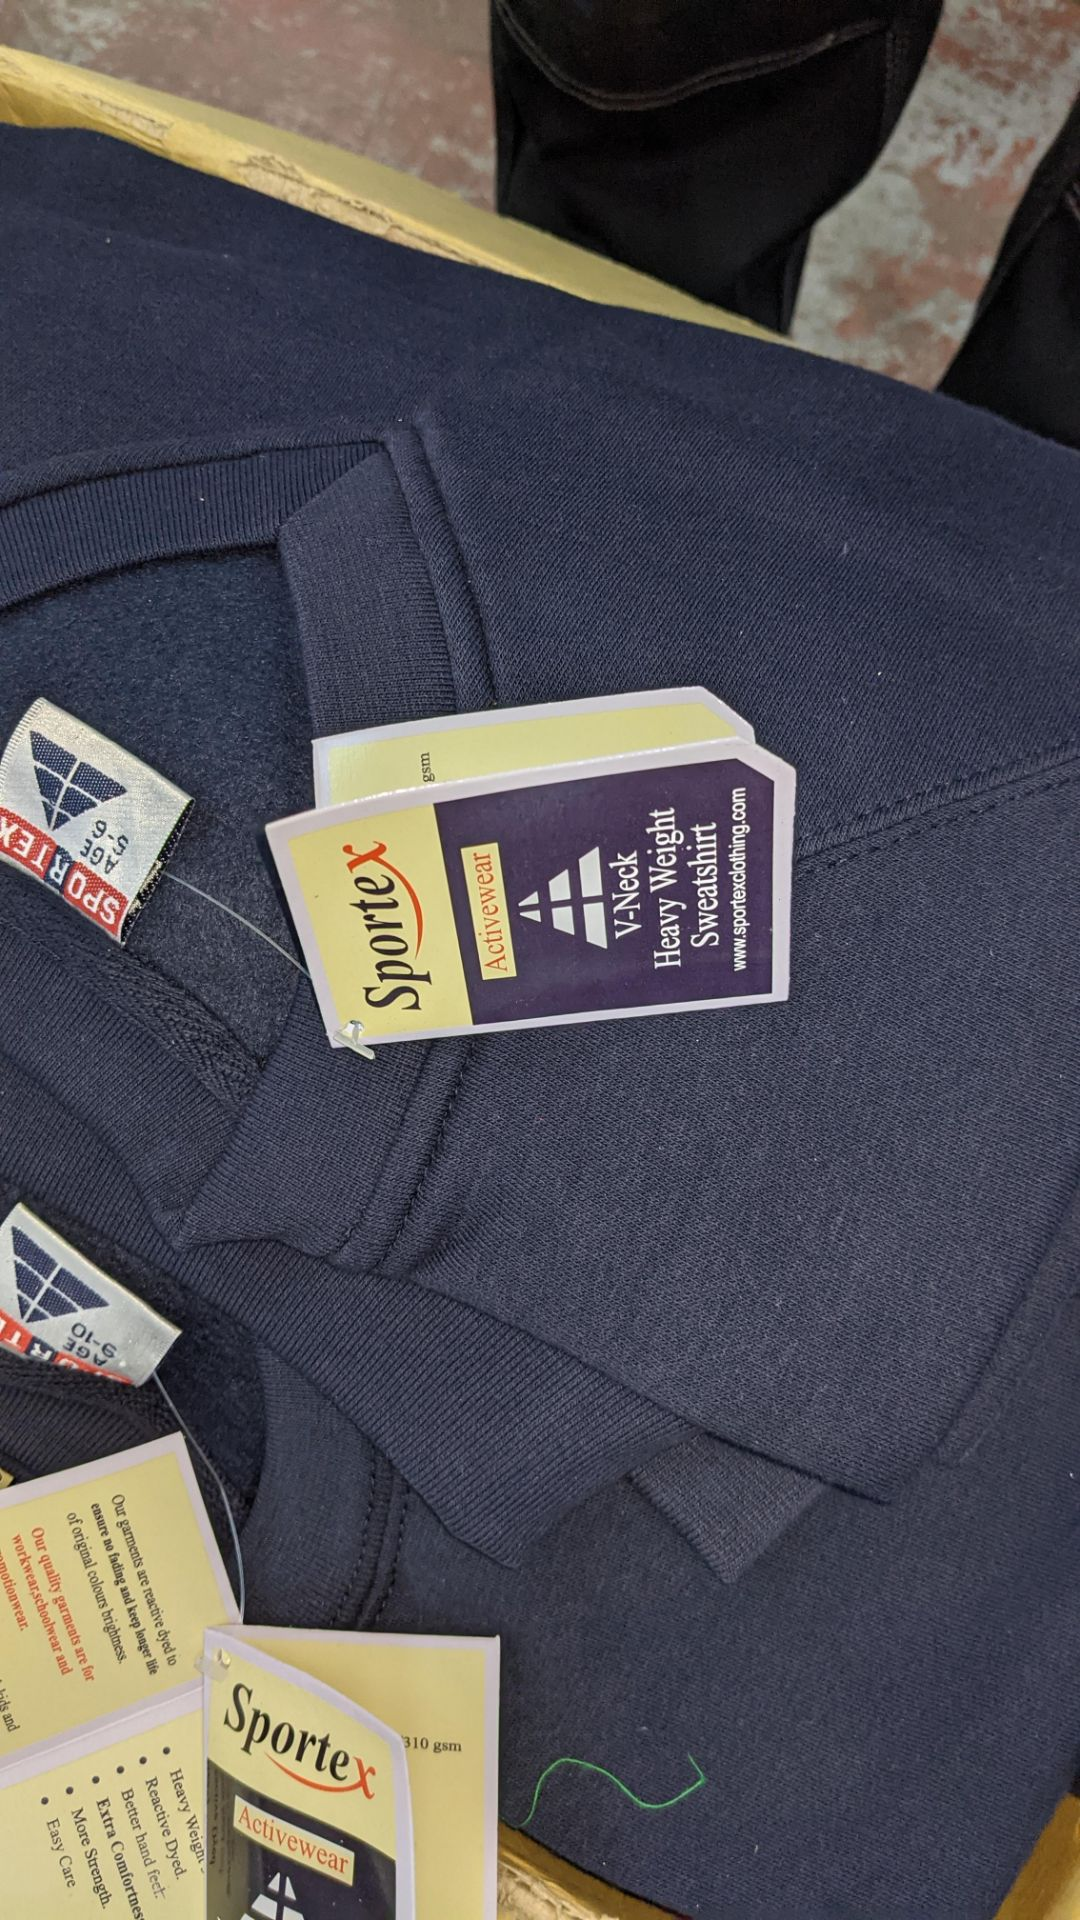 Approx 14 off Sportex children's blue V-neck sweatshirts - Image 4 of 4